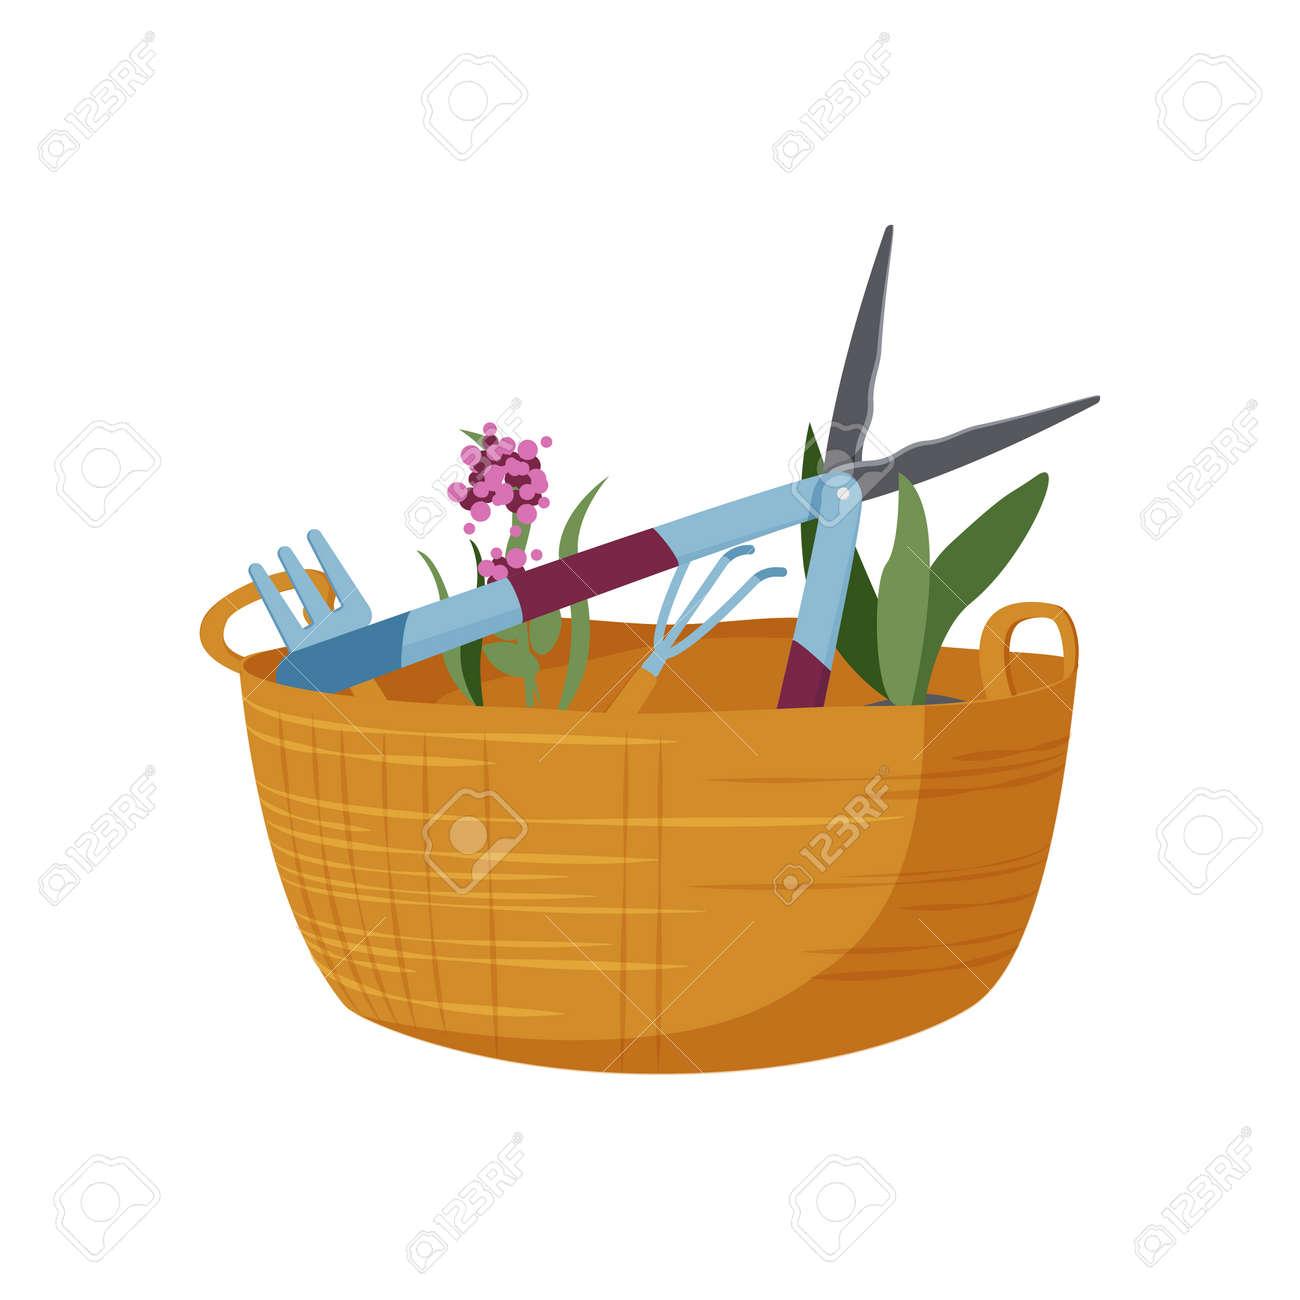 Gardening Tools Icon - 171558590